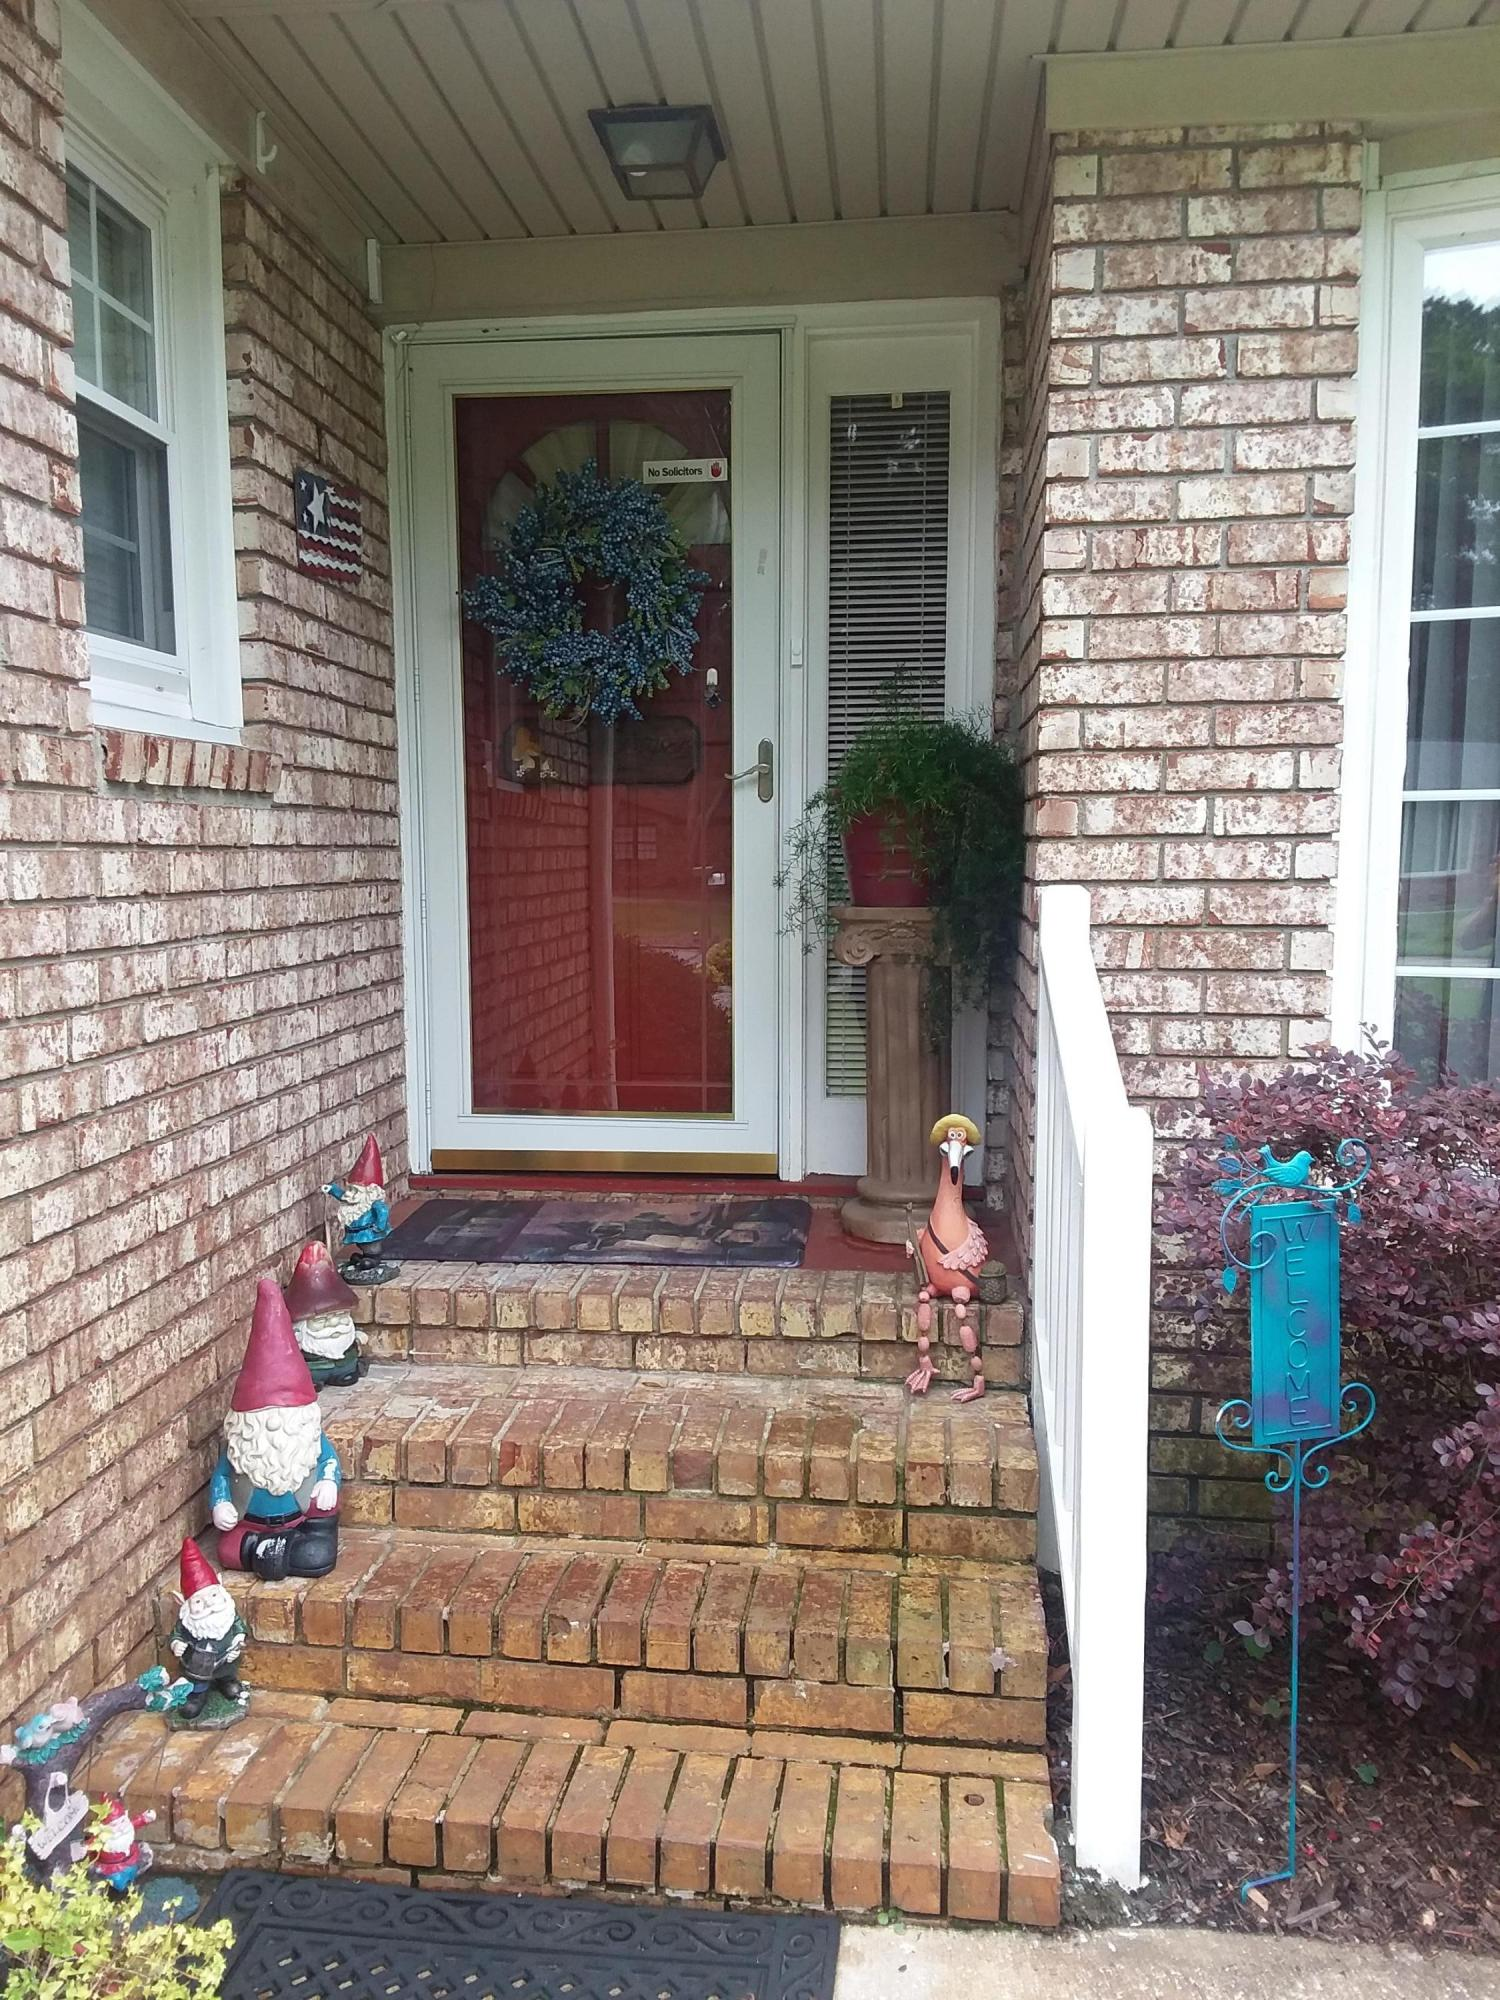 Heathwood Ext Homes For Sale - 9 Edenwood, Charleston, SC - 3